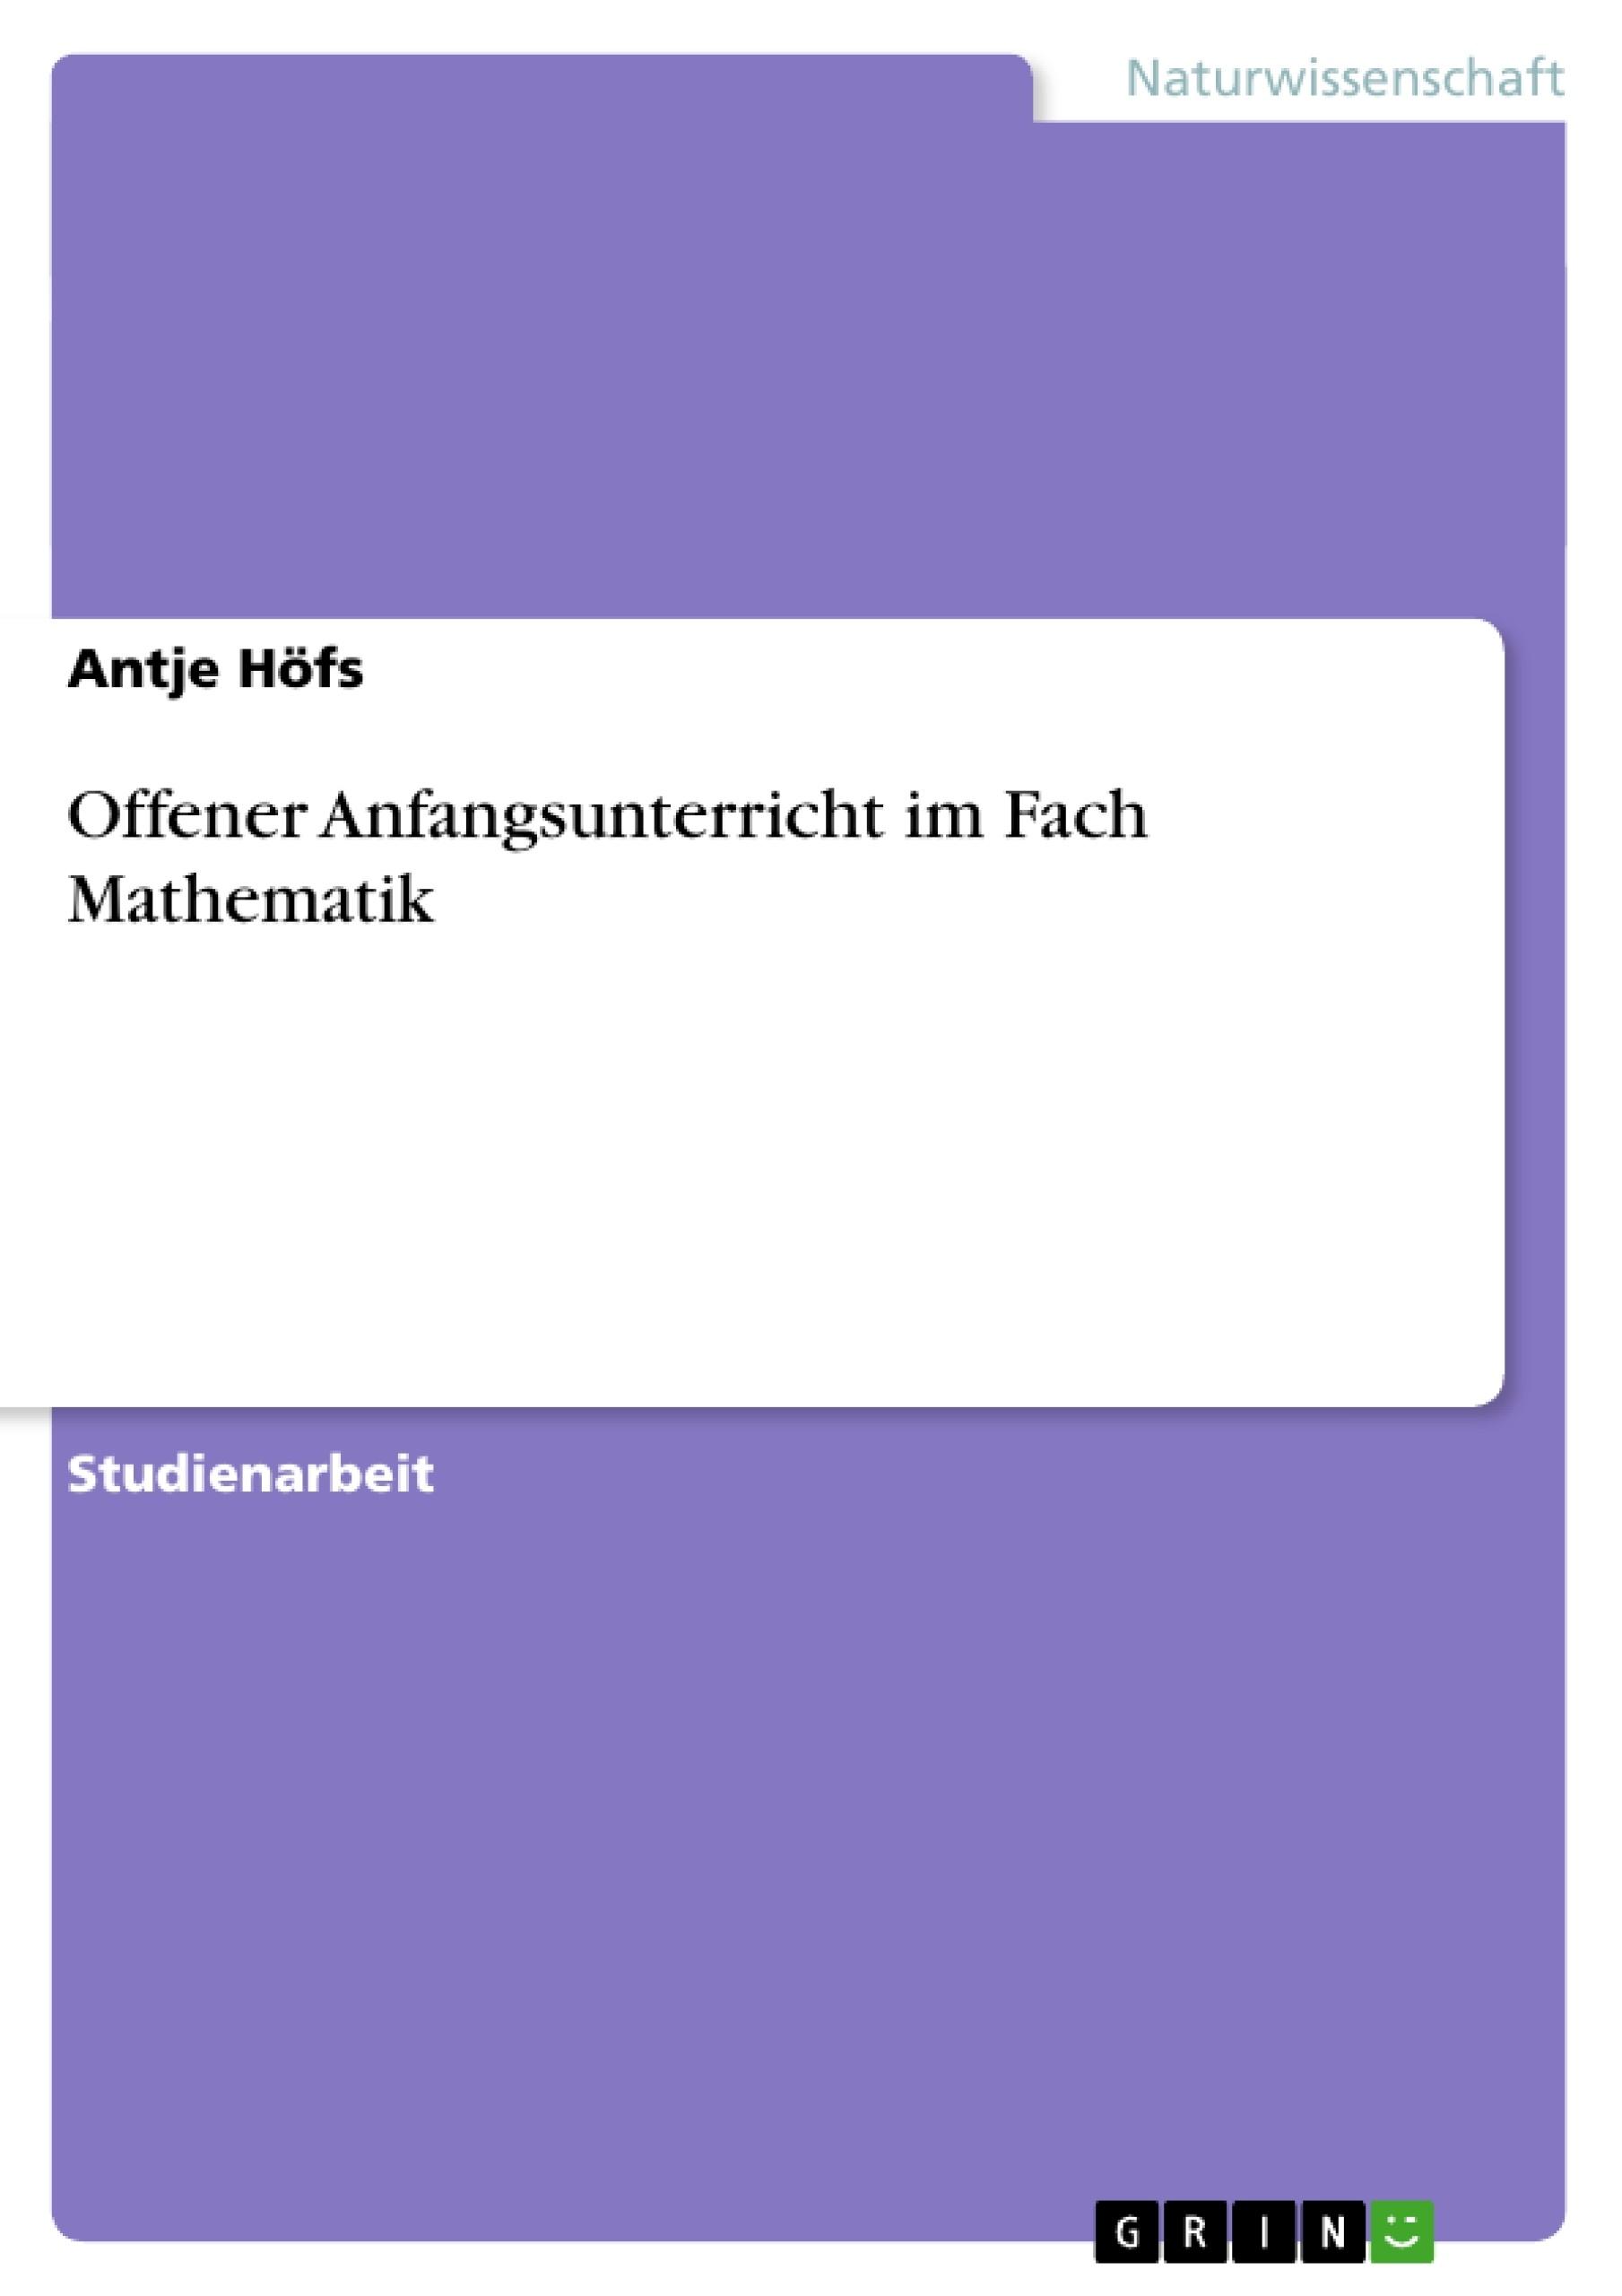 Titel: Offener Anfangsunterricht im Fach Mathematik